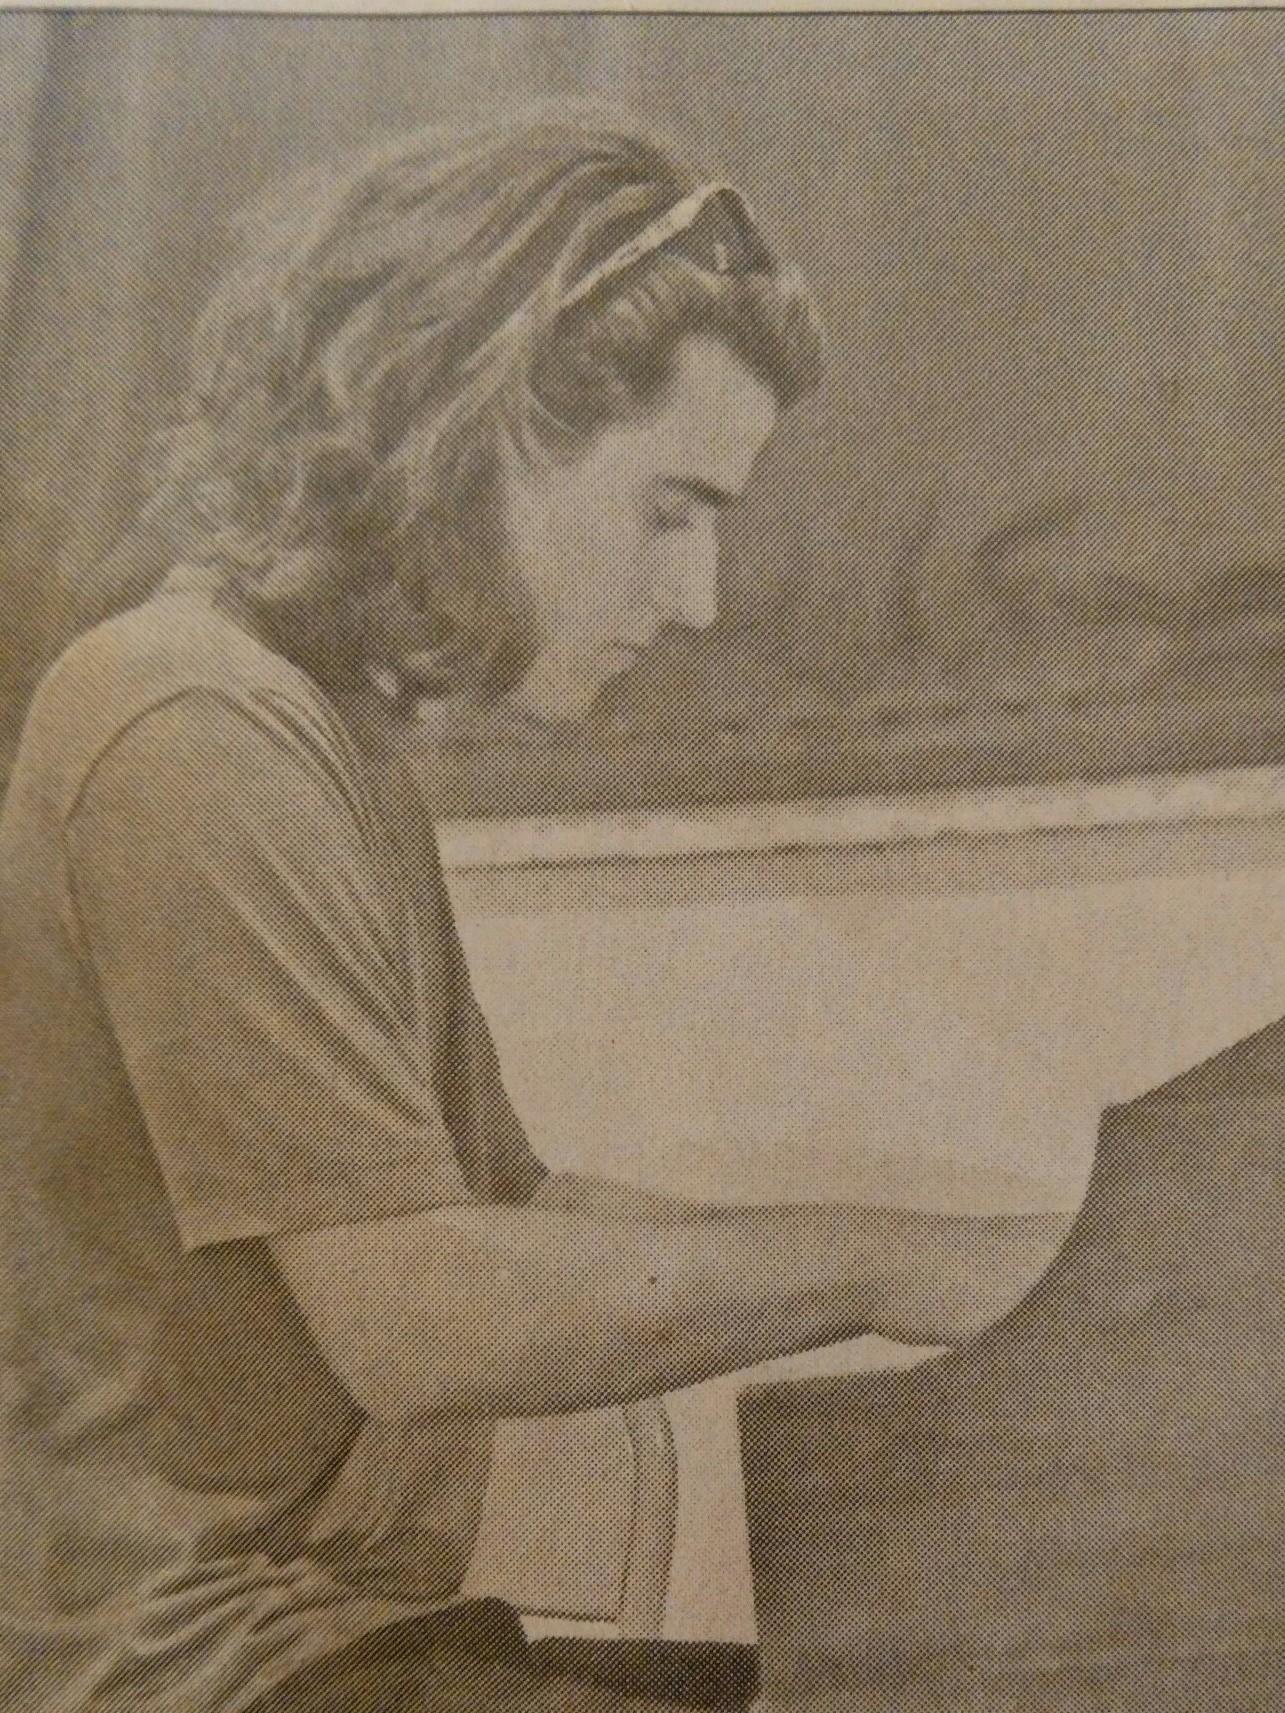 James Kraus Pianist